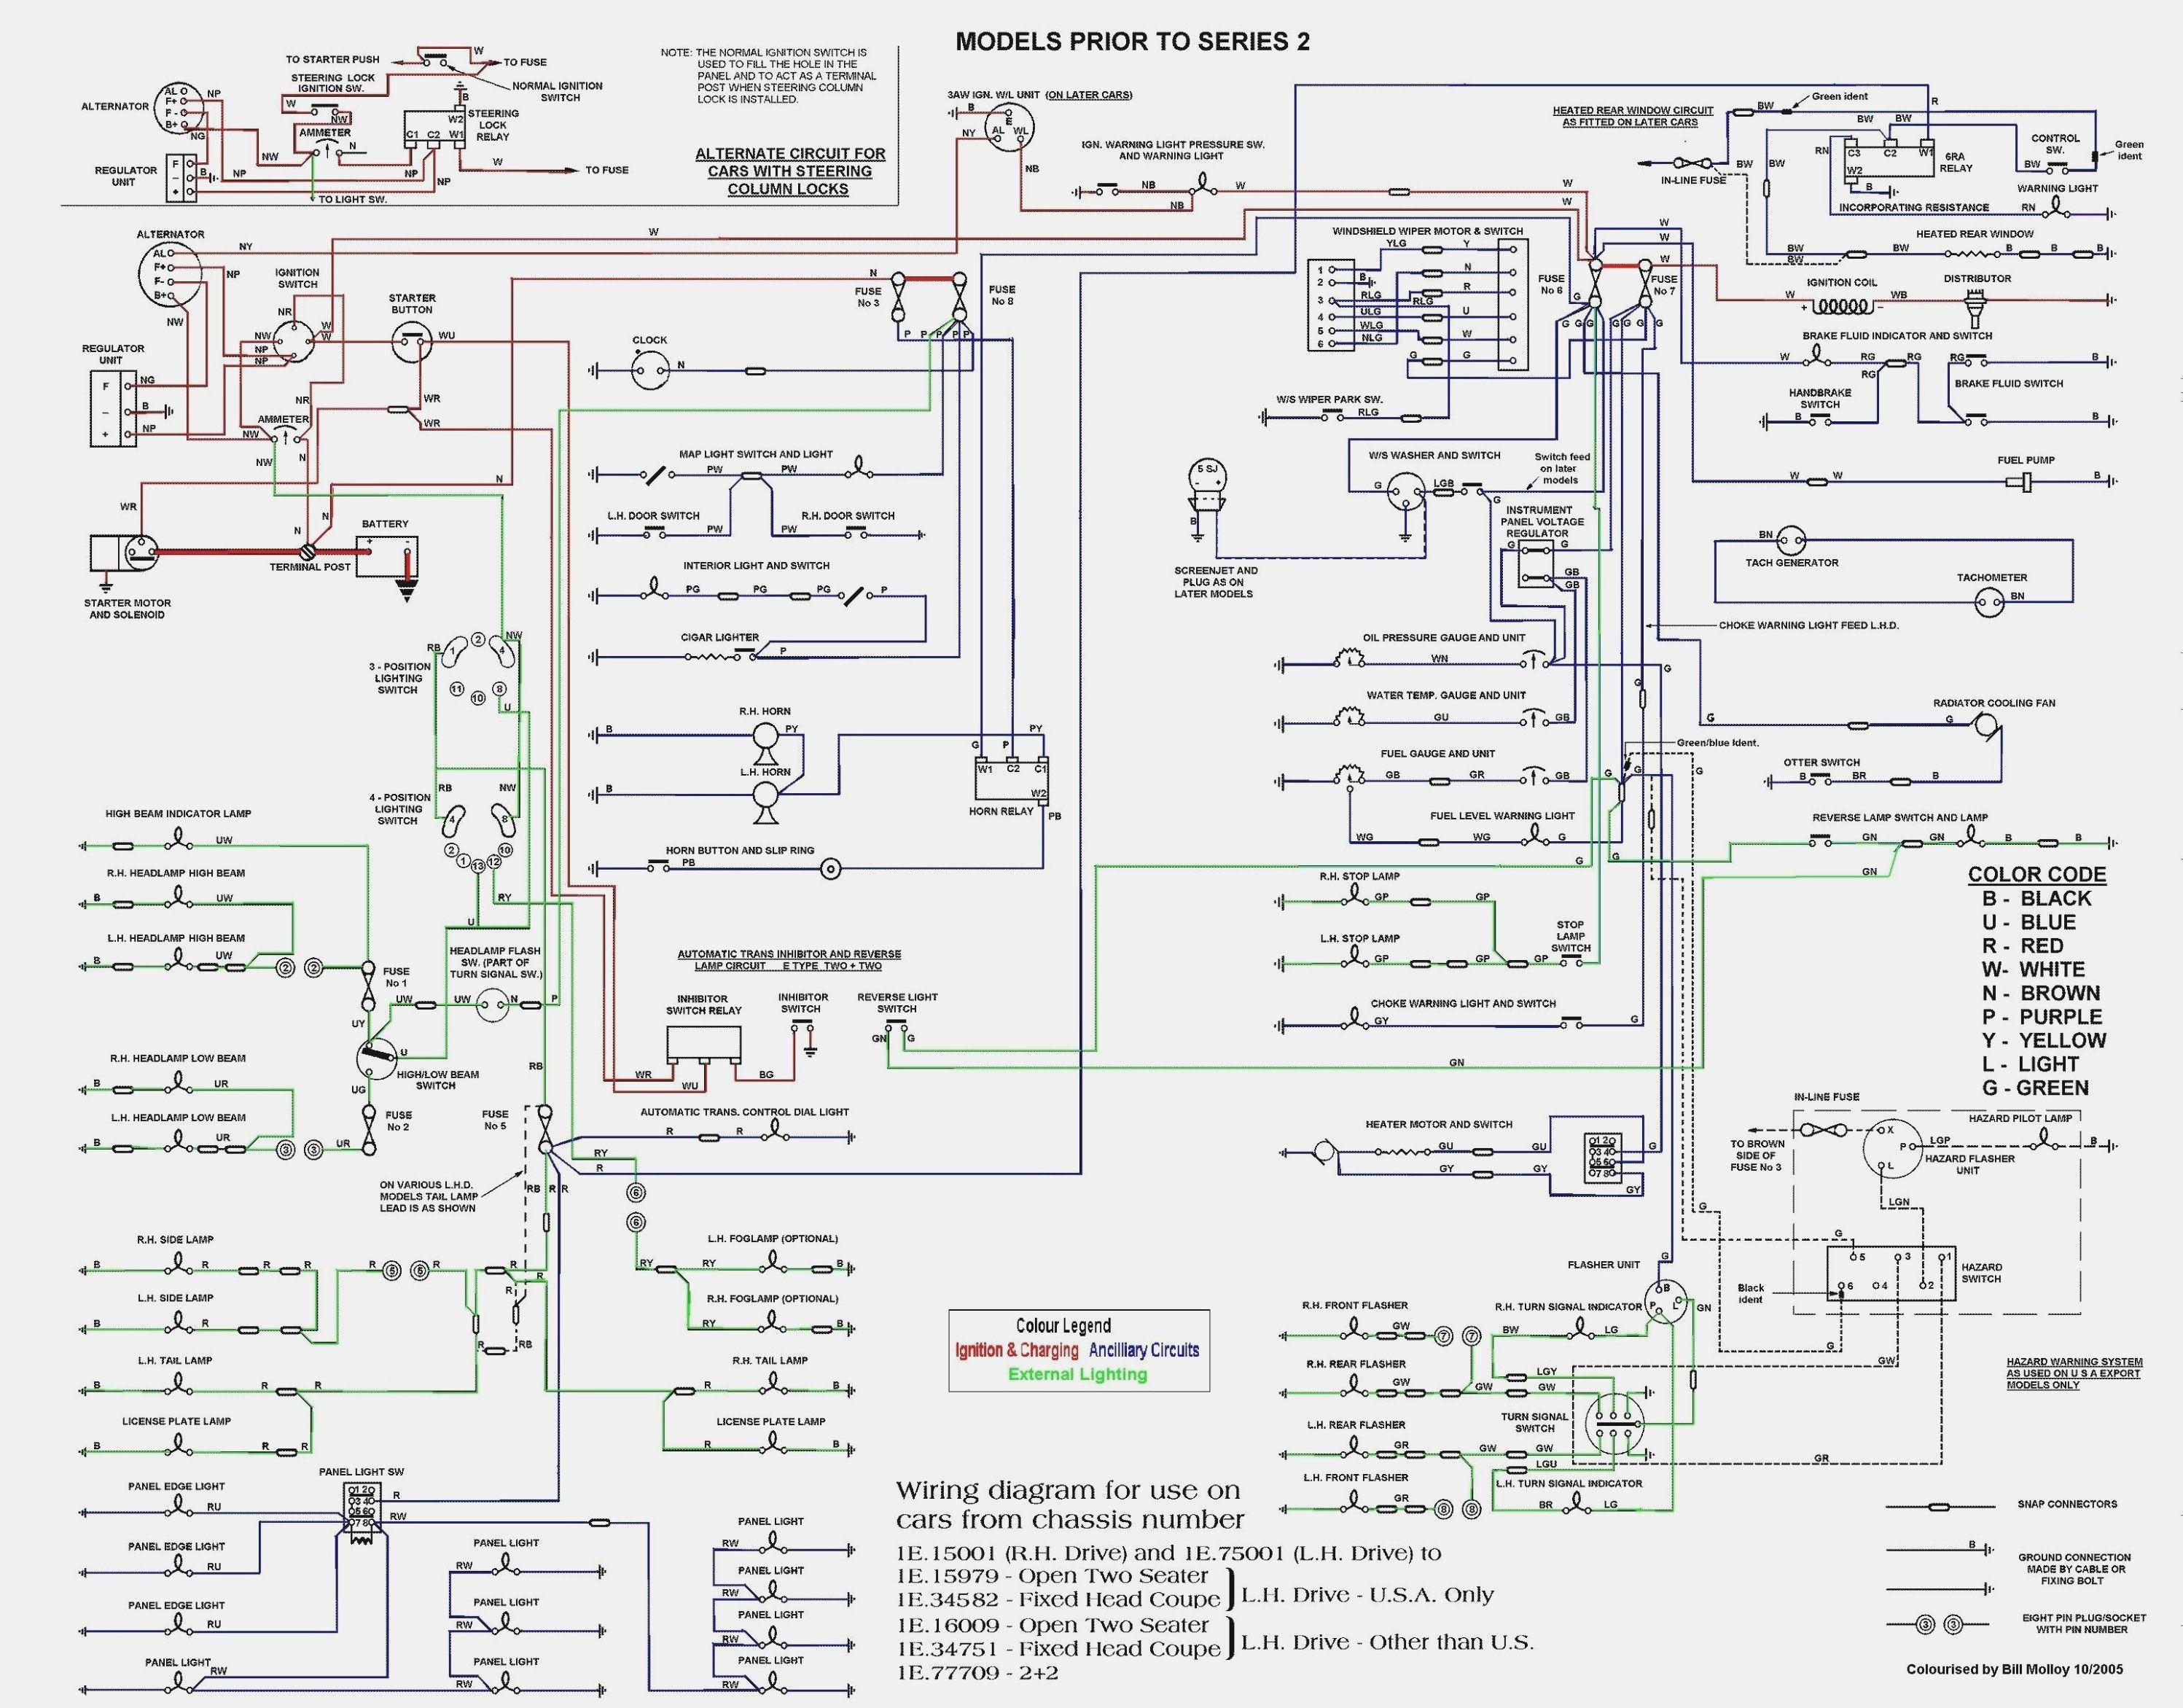 New Contactor Wiring Diagram Ac Unit Electrical Diagram Electrical Wiring Diagram Circuit Diagram